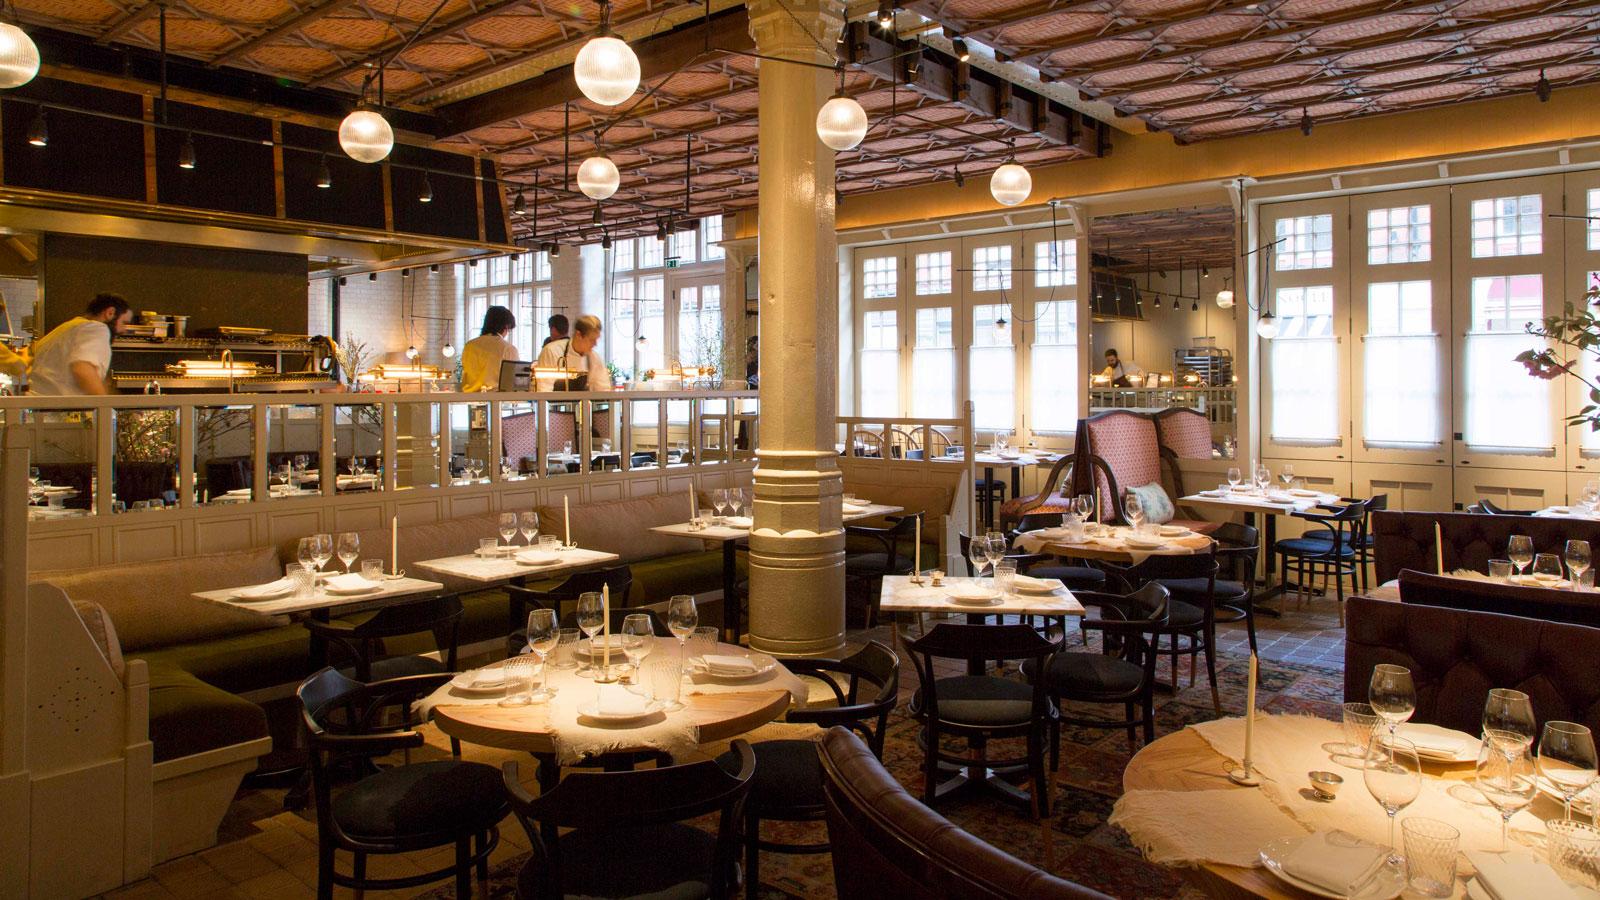 Best London Restaurants According To Lti Cnn Travel